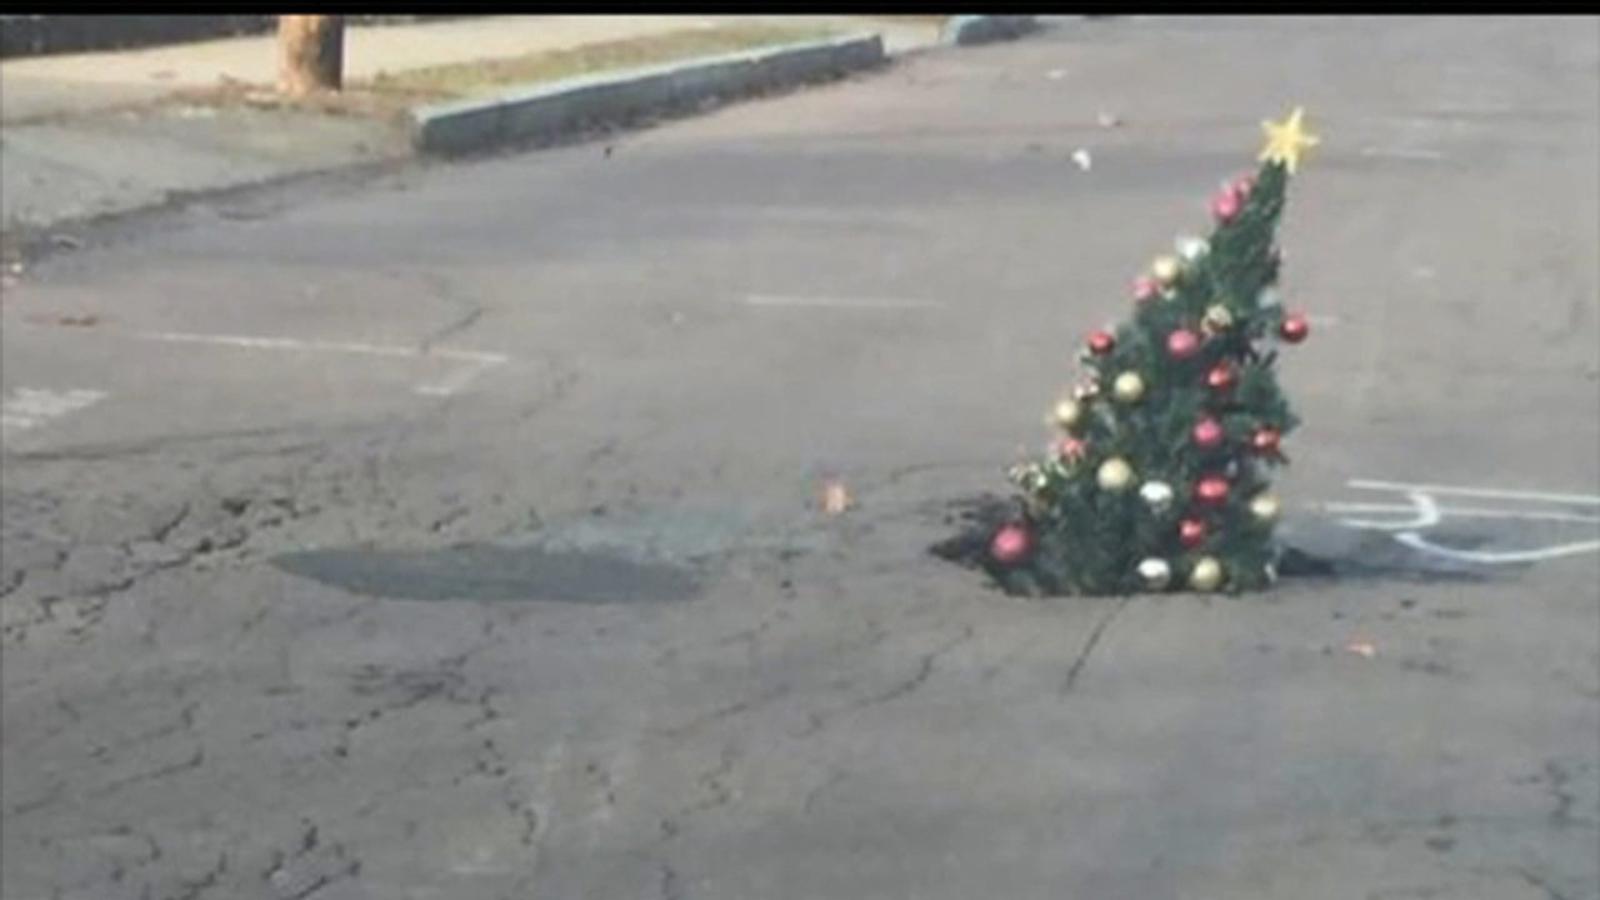 Wilkes Barre Pennsylvania Residents Fill Growing Pothole